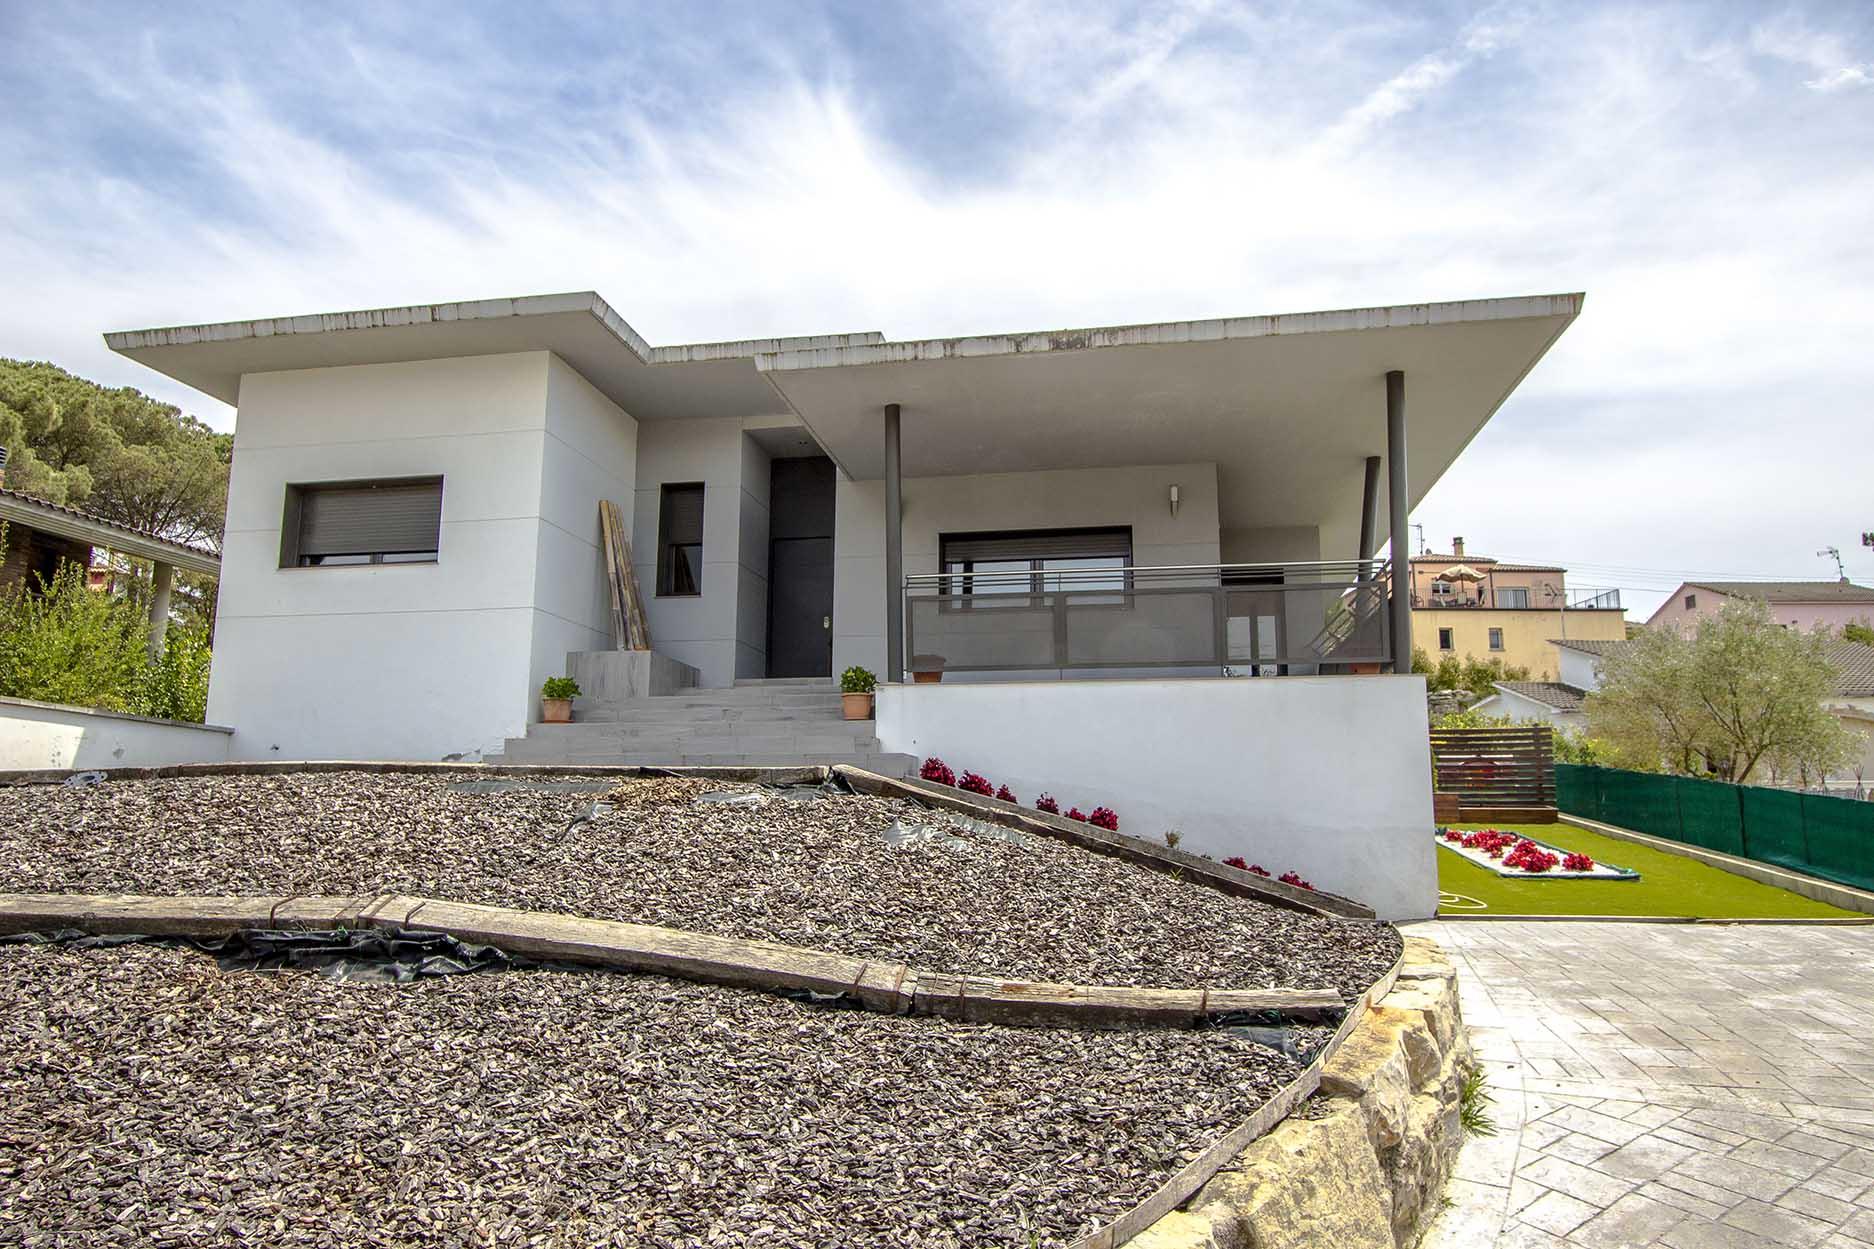 Ferienhaus Catalunya Casas: Modern villa in Sils, 15 min drive to Costa Brava beaches! (1902227), Les Mallorquines, Girona, Katalonien, Spanien, Bild 28